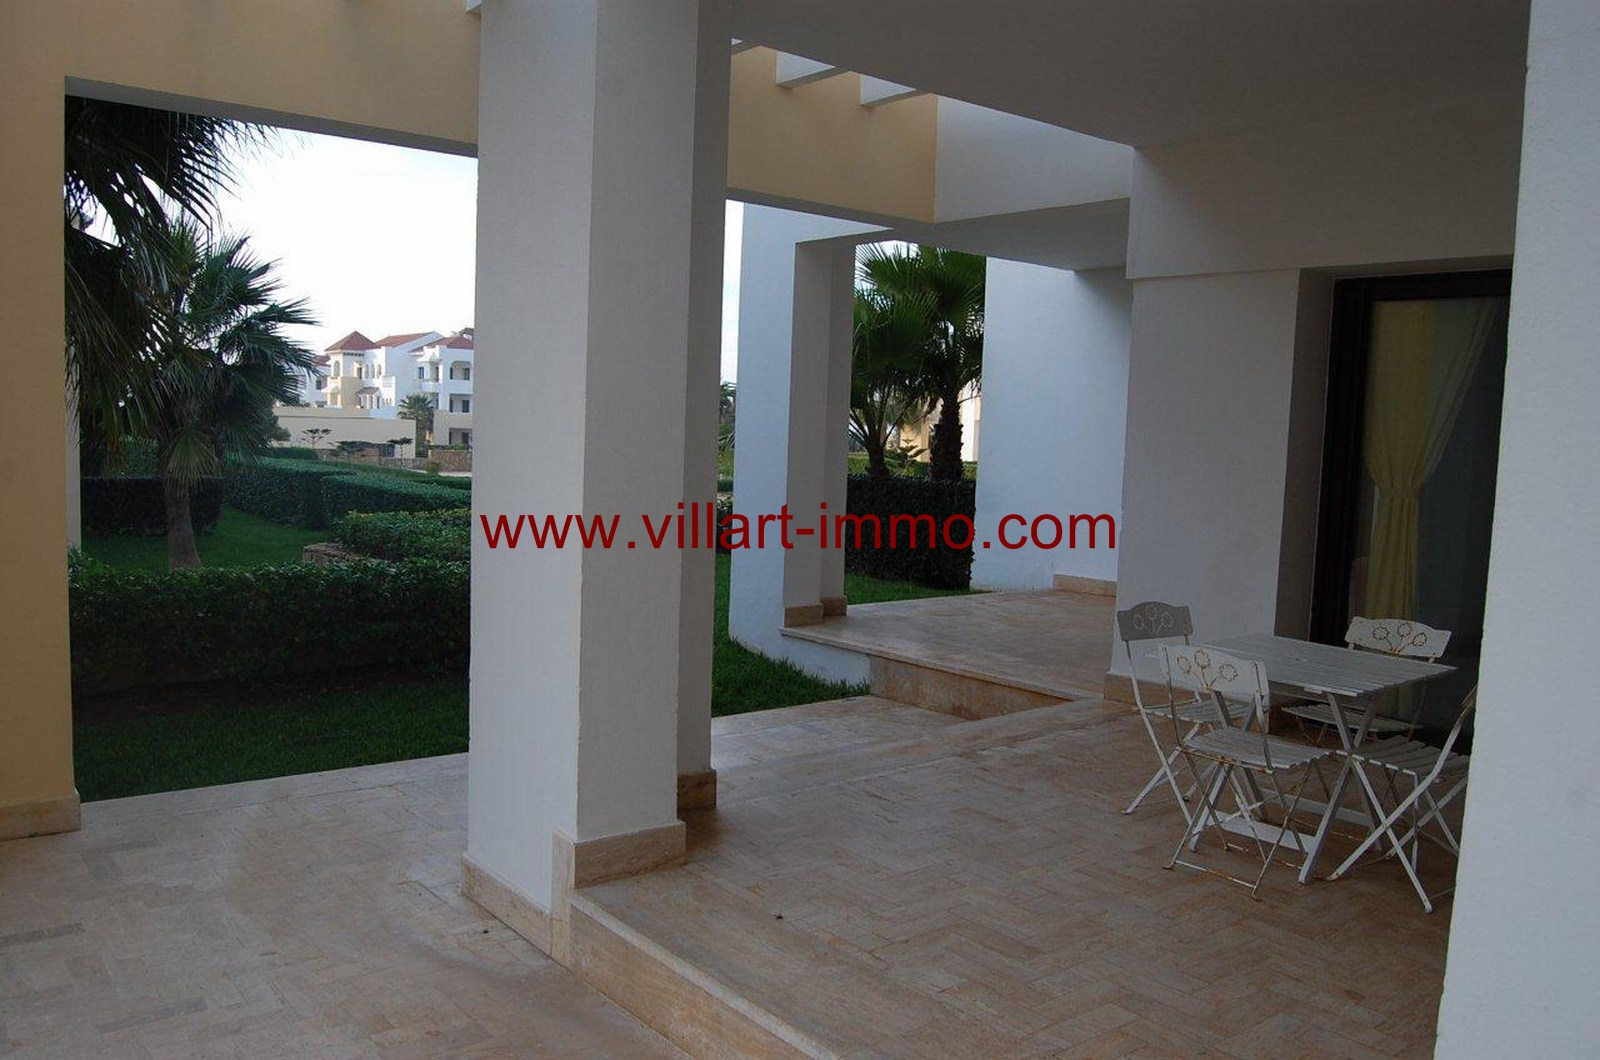 2-vente-appartement-tanger-achakar-terrasse-2-va390-villart-immo